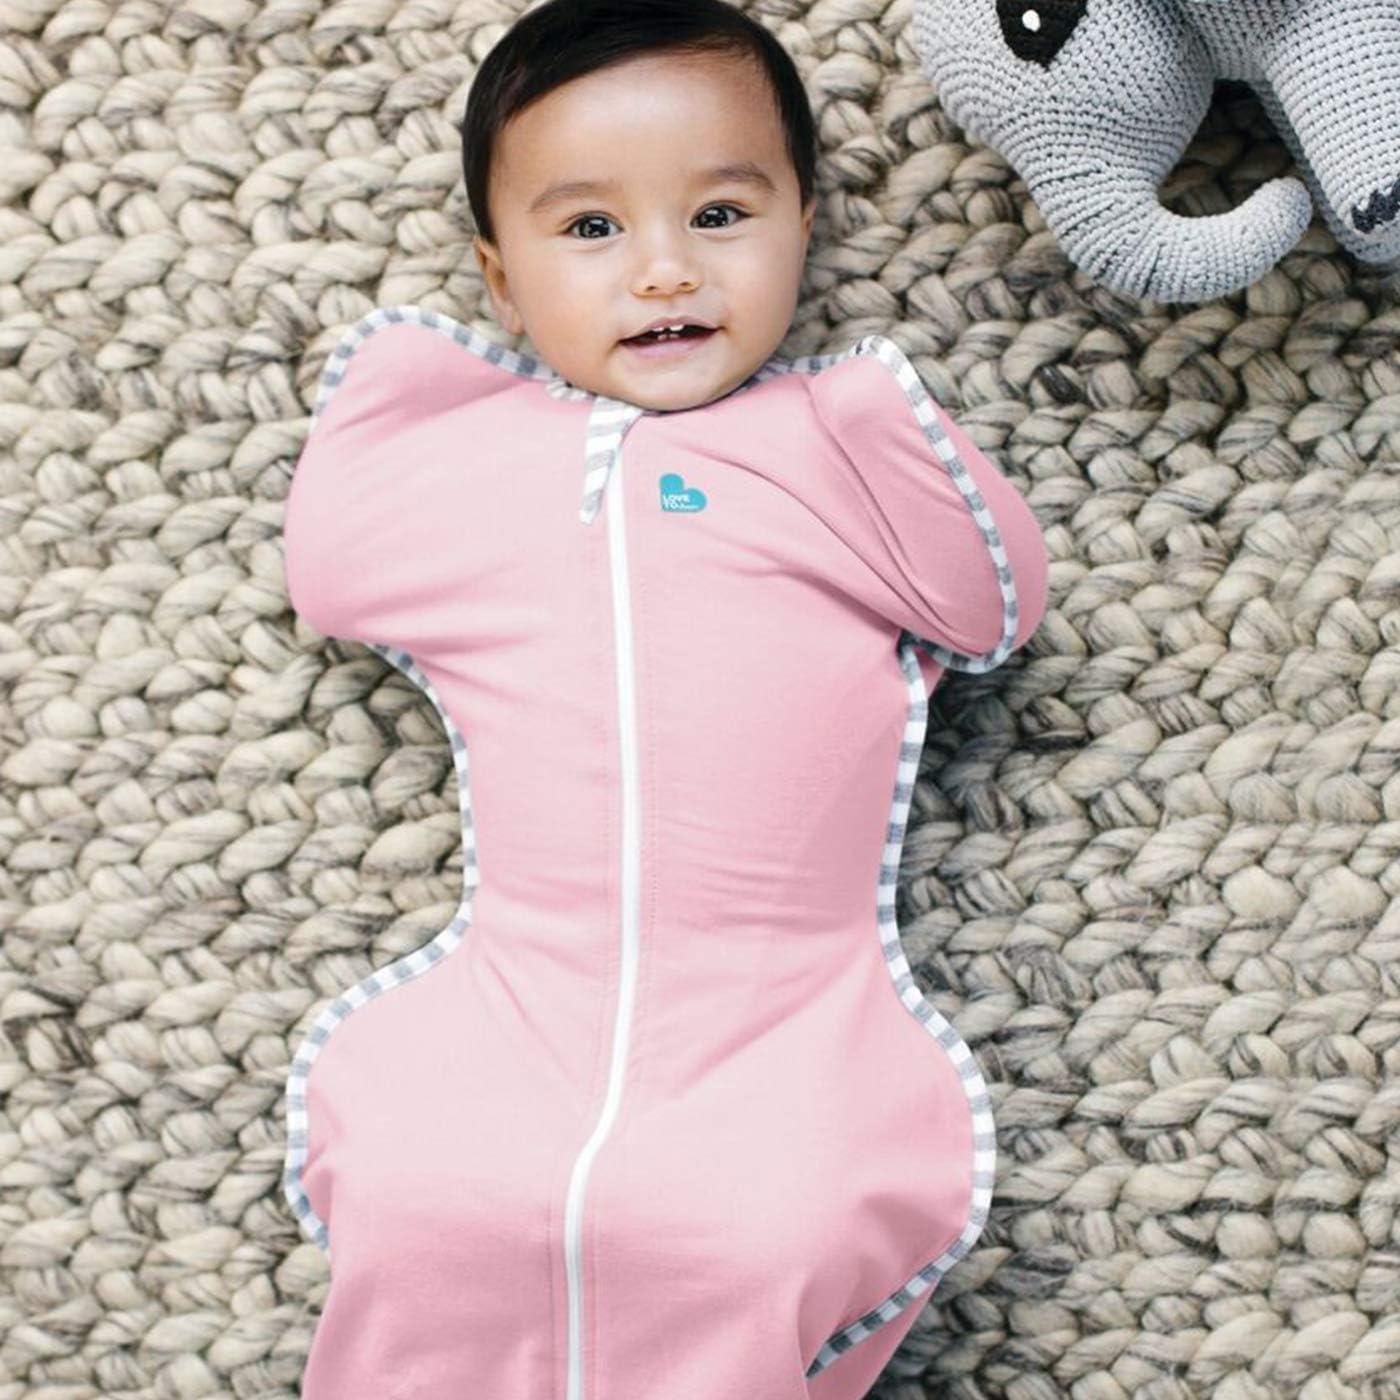 Newborn 2.2kg-3.8kg Swaddle Blanket 1.0 TOG Love To Dream Swaddle UP Original White